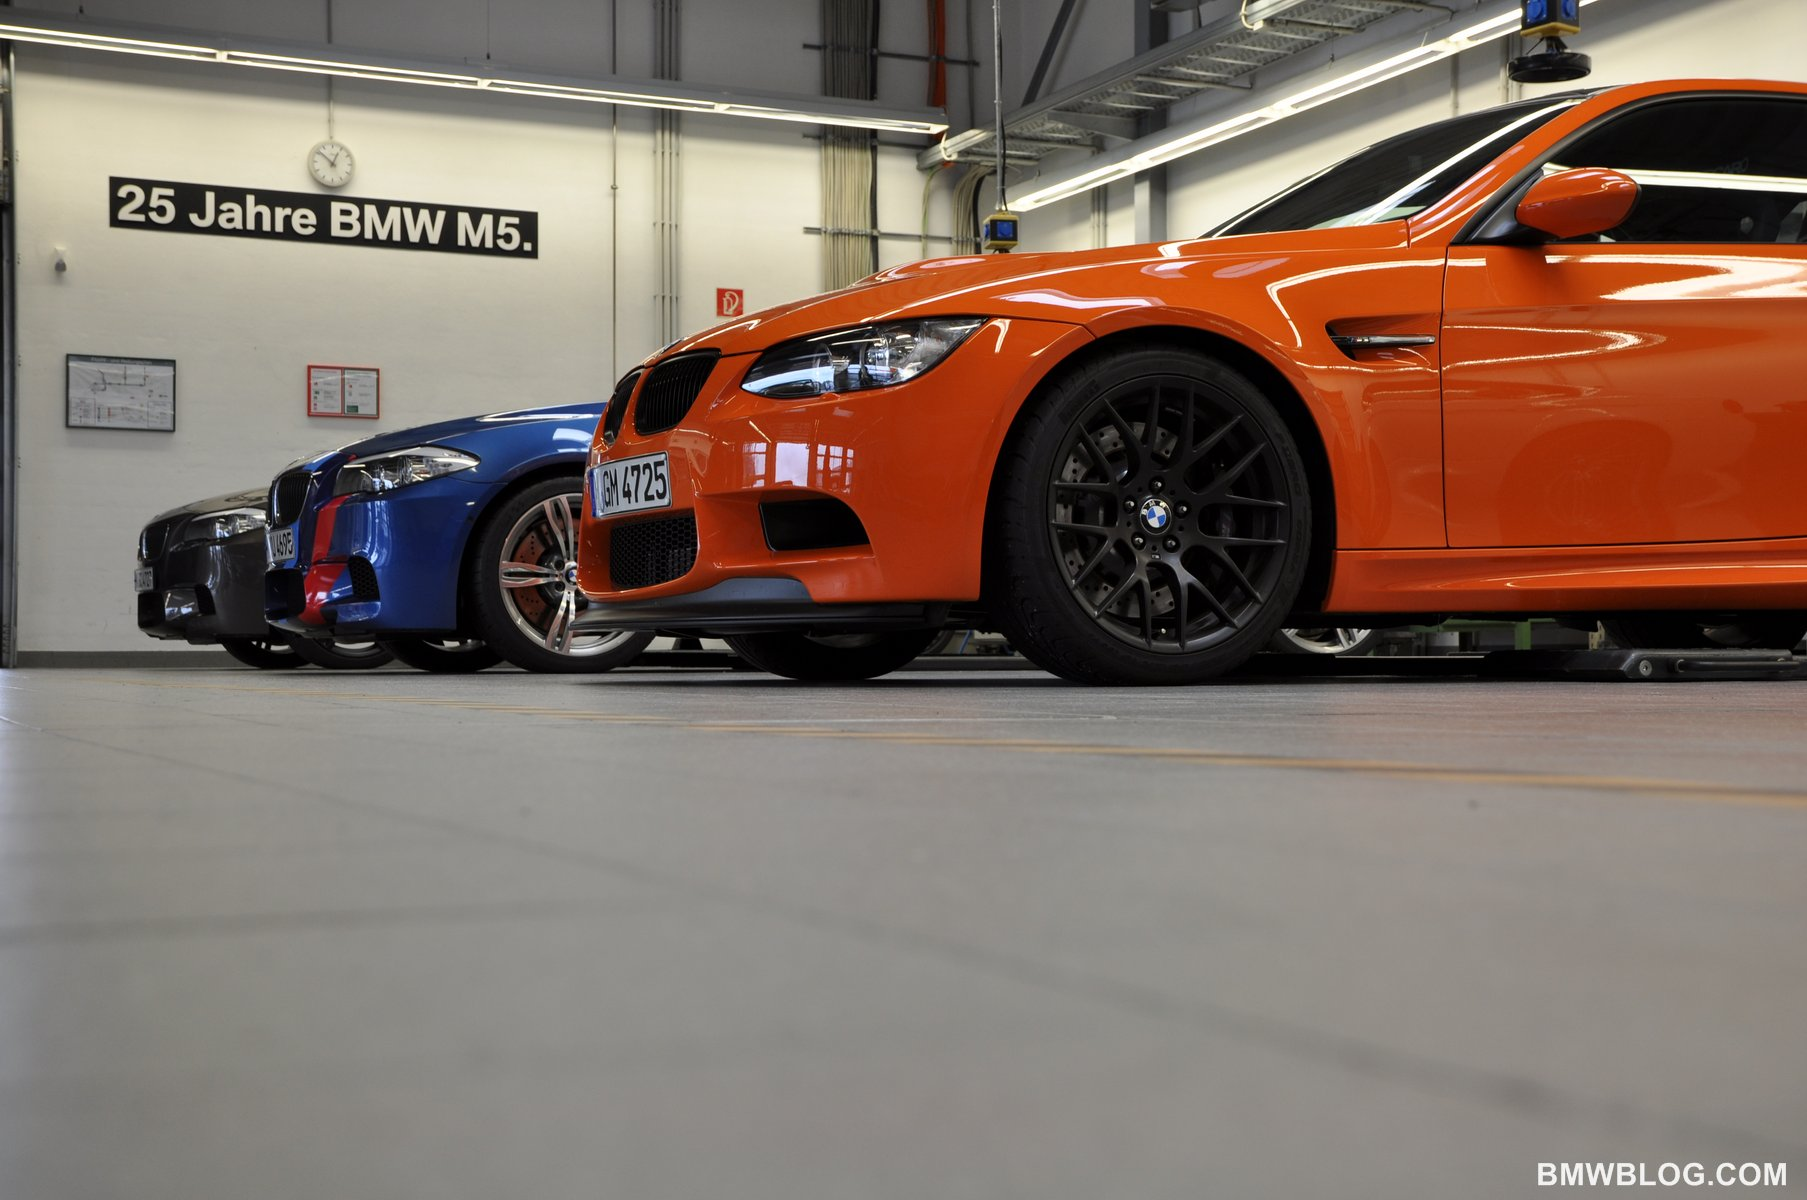 24 hr nurburgring BMW 111